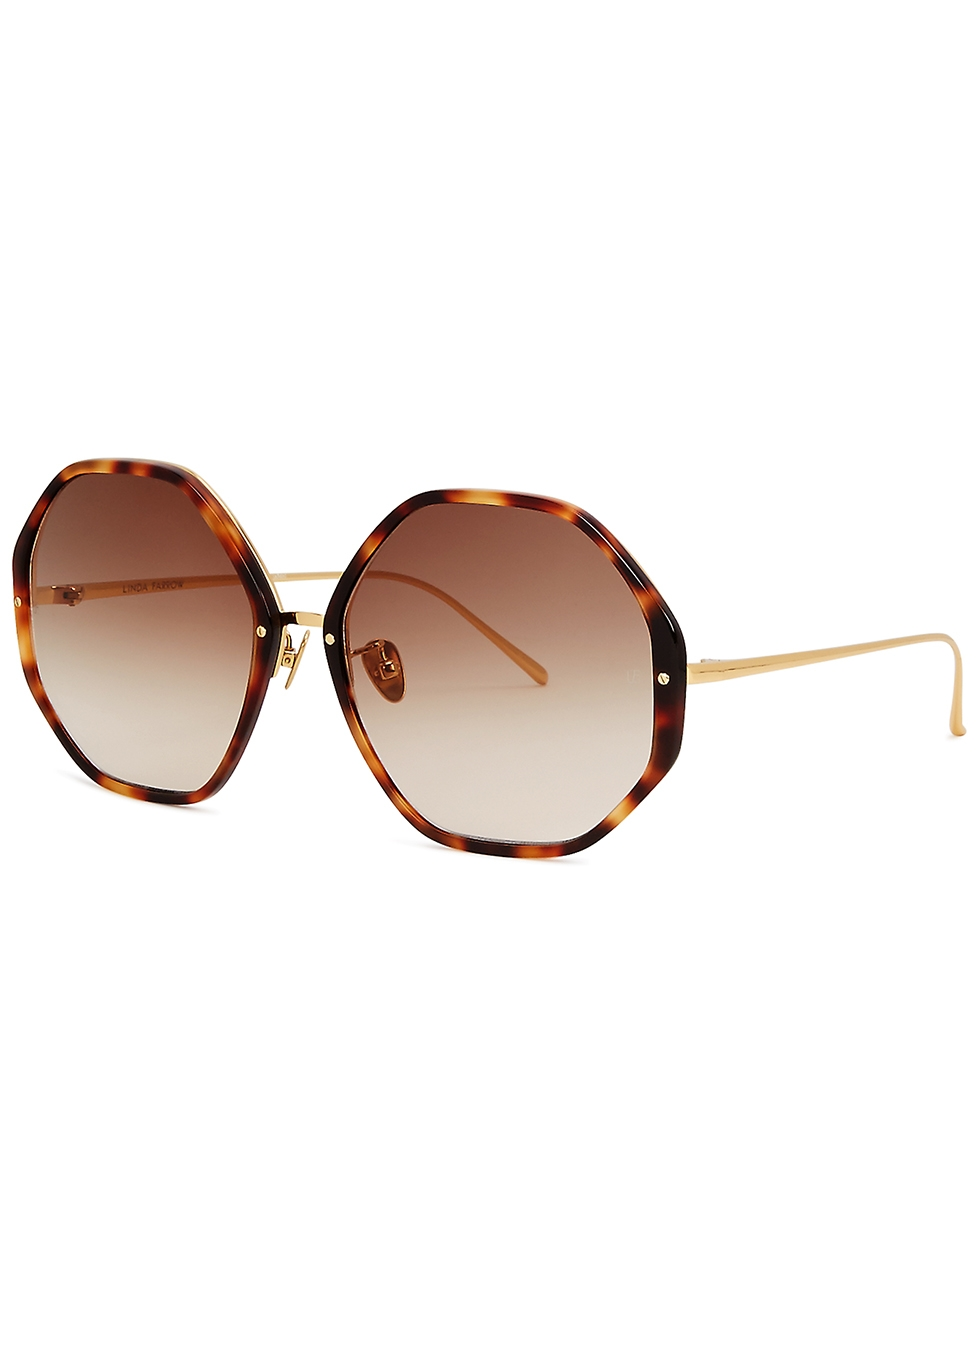 LINDA FARROW LUXE 901 Tortoiseshell Oversized Sunglasses in Brown